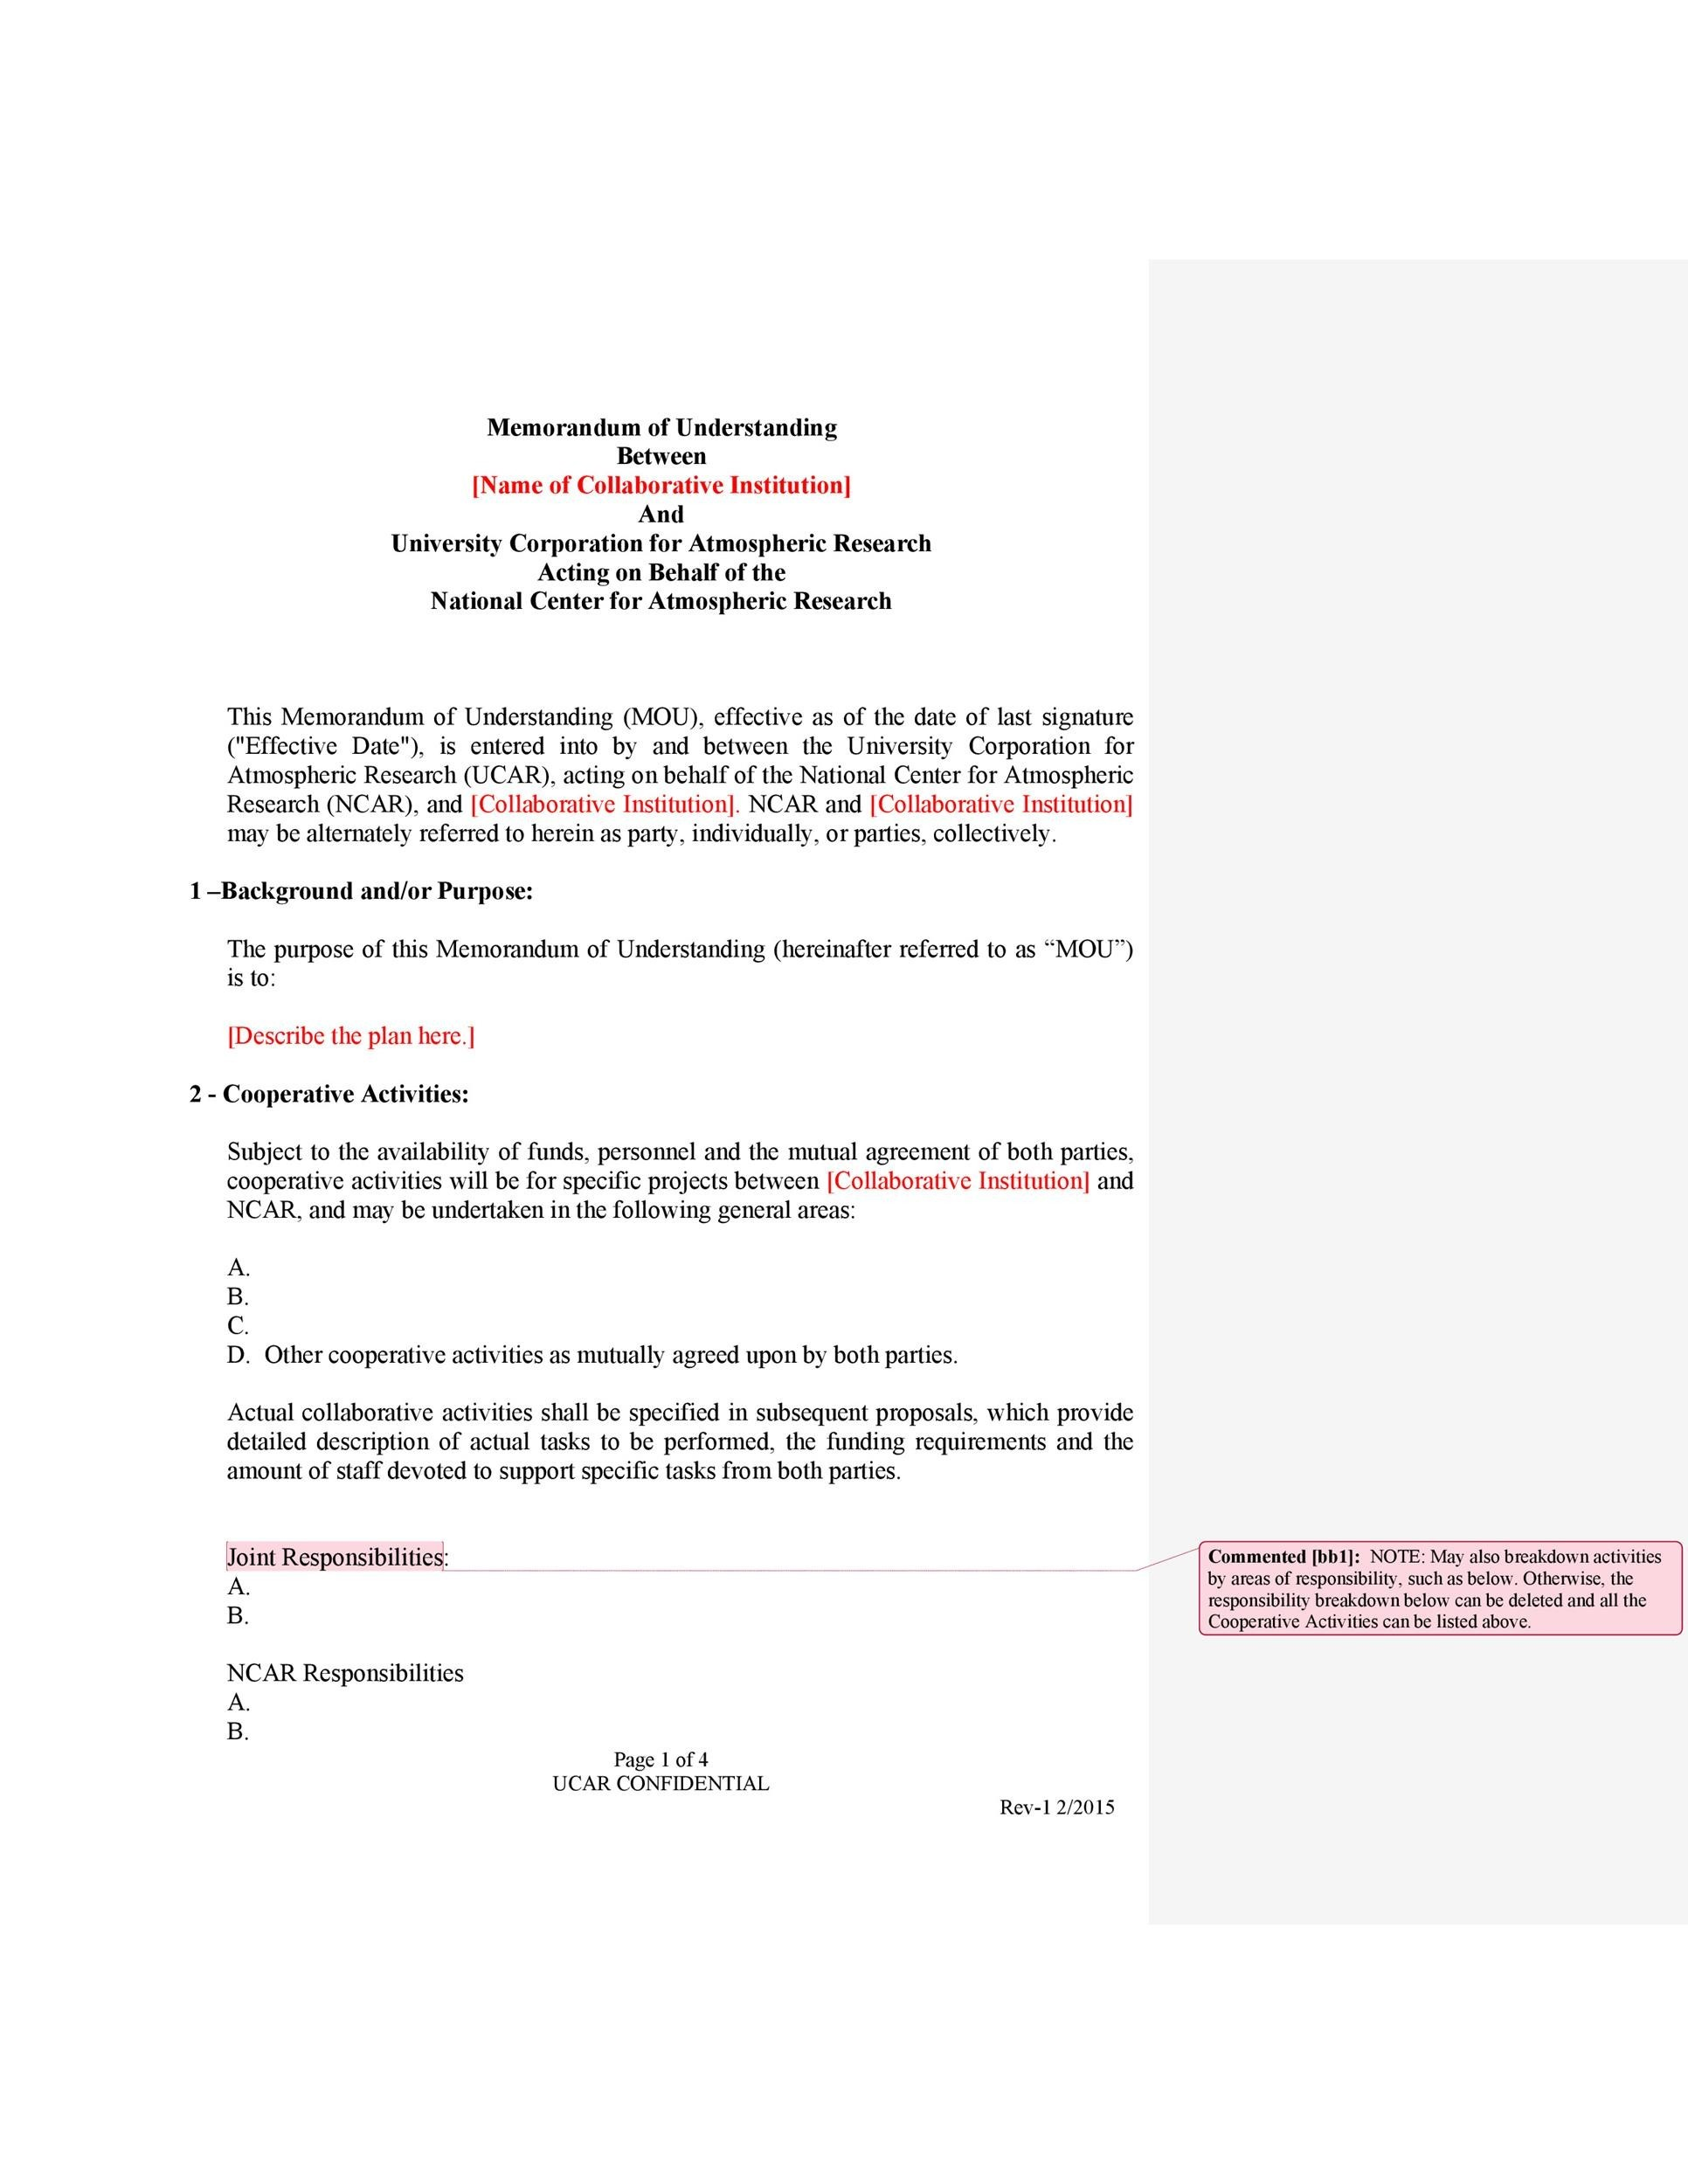 Memorandum Of Agreement Template | 50 Free Memorandum Of Understanding Templates Word Template Lab